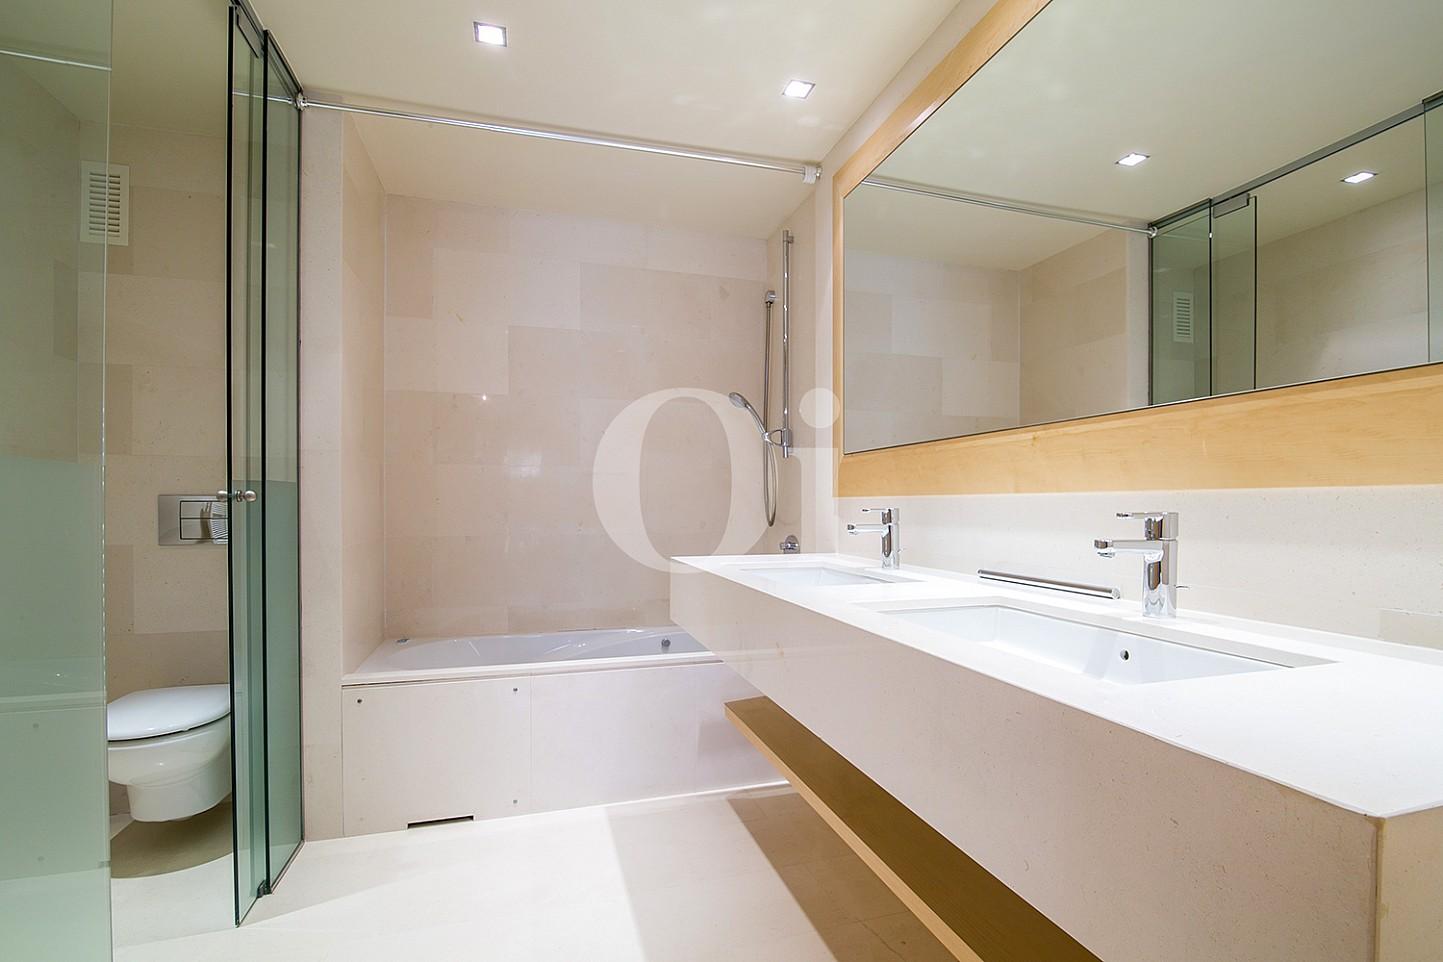 Baño con bañera de precioso apartamento en venta en Saria, Barcelona